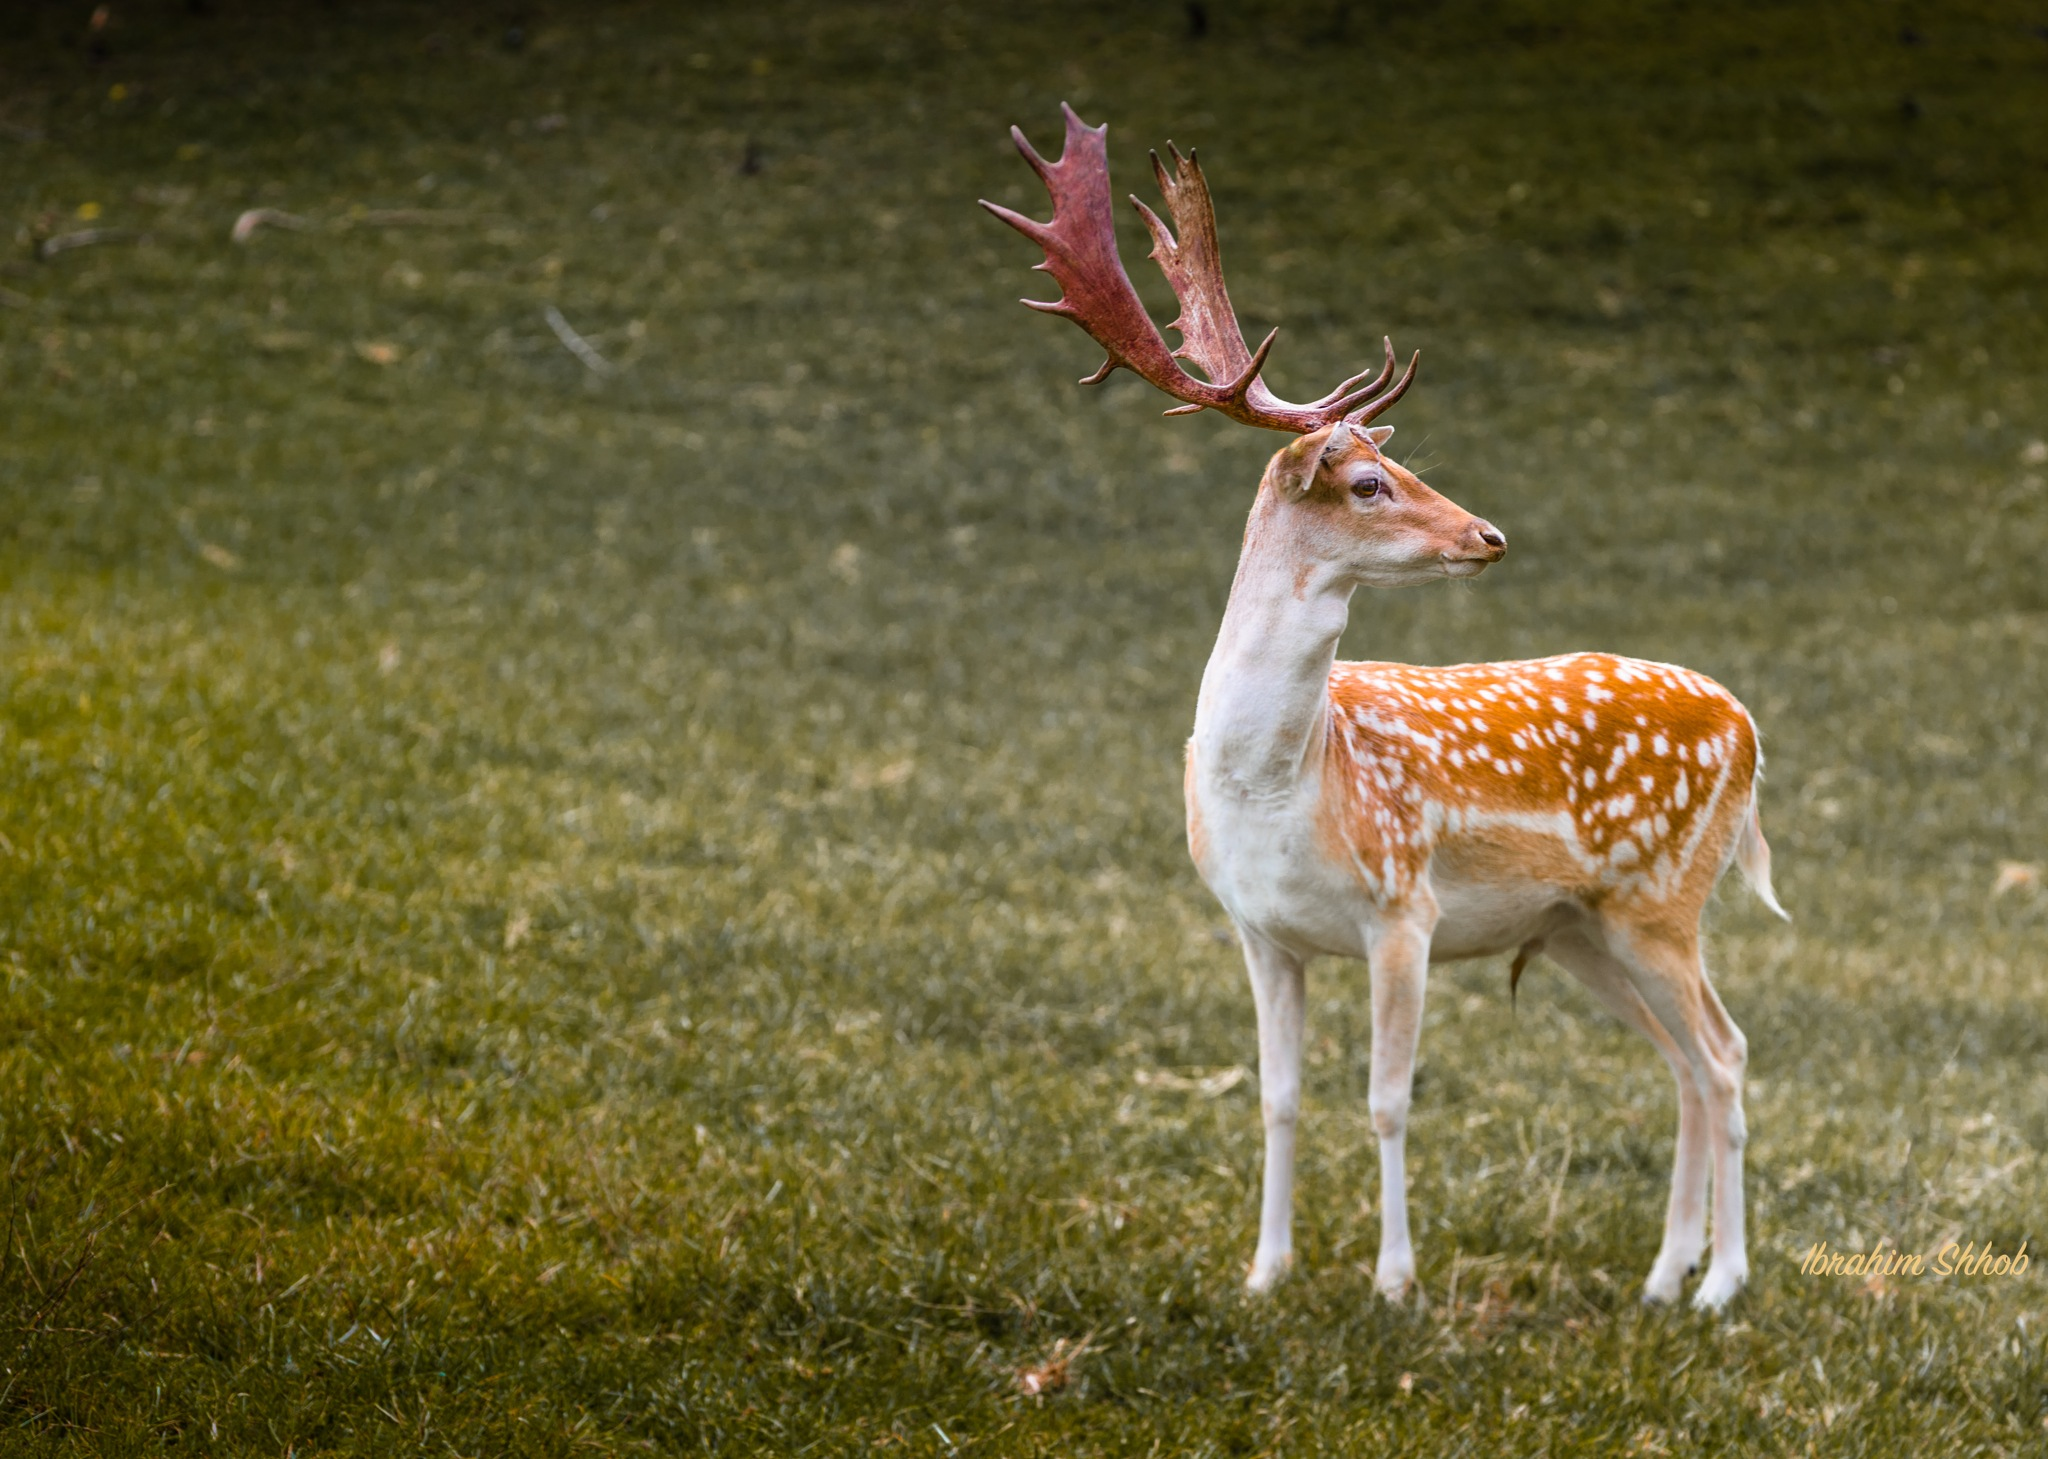 Deer 101 by Ibrahim shhob